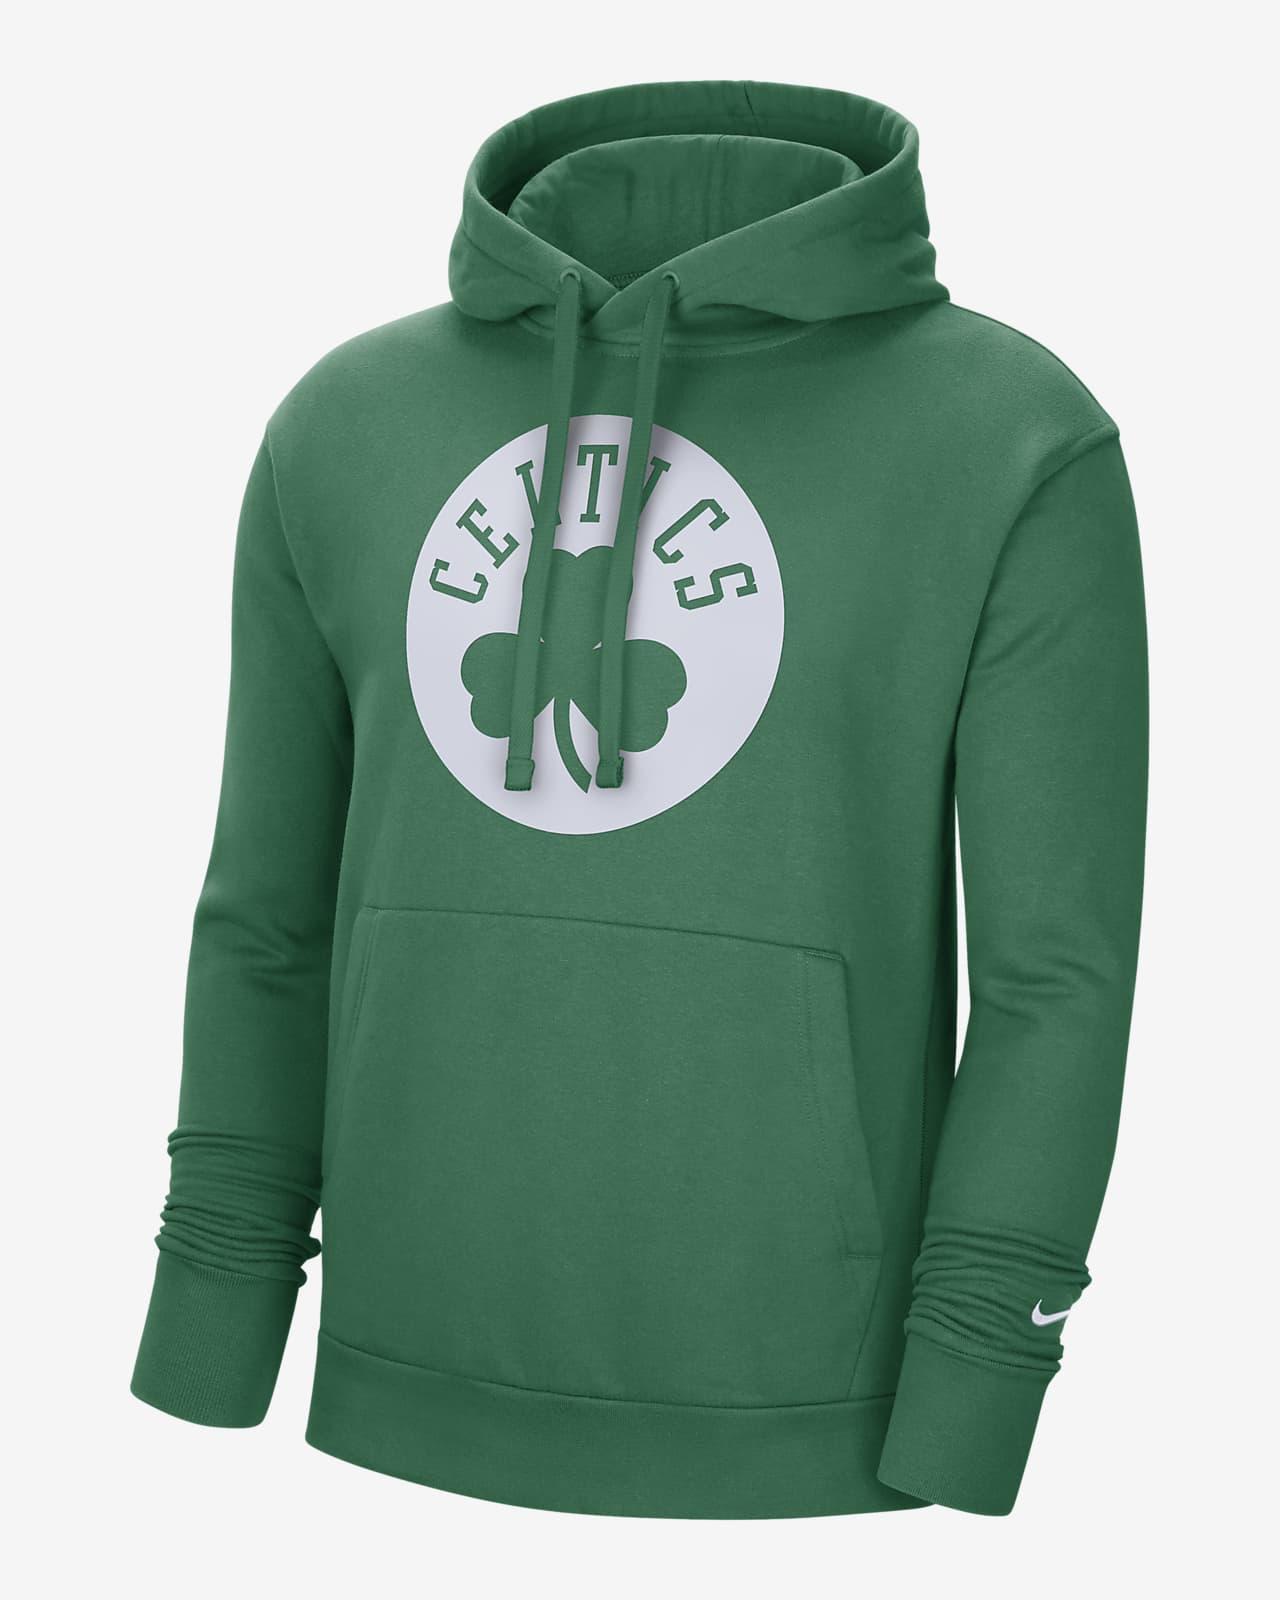 Hoodie pullover NBA Nike Boston Celtics Essential para homem